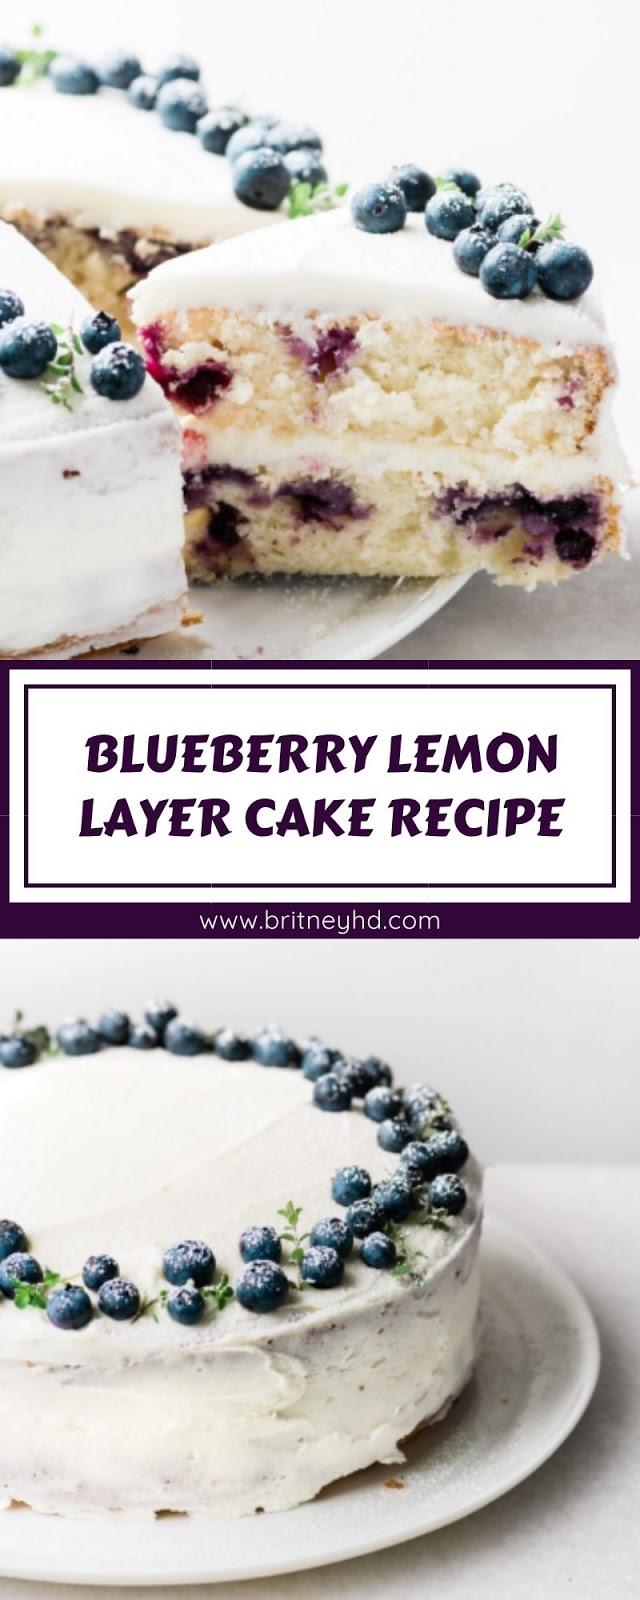 BLUEBERRY LEMON LAYER CAKE RECIPE